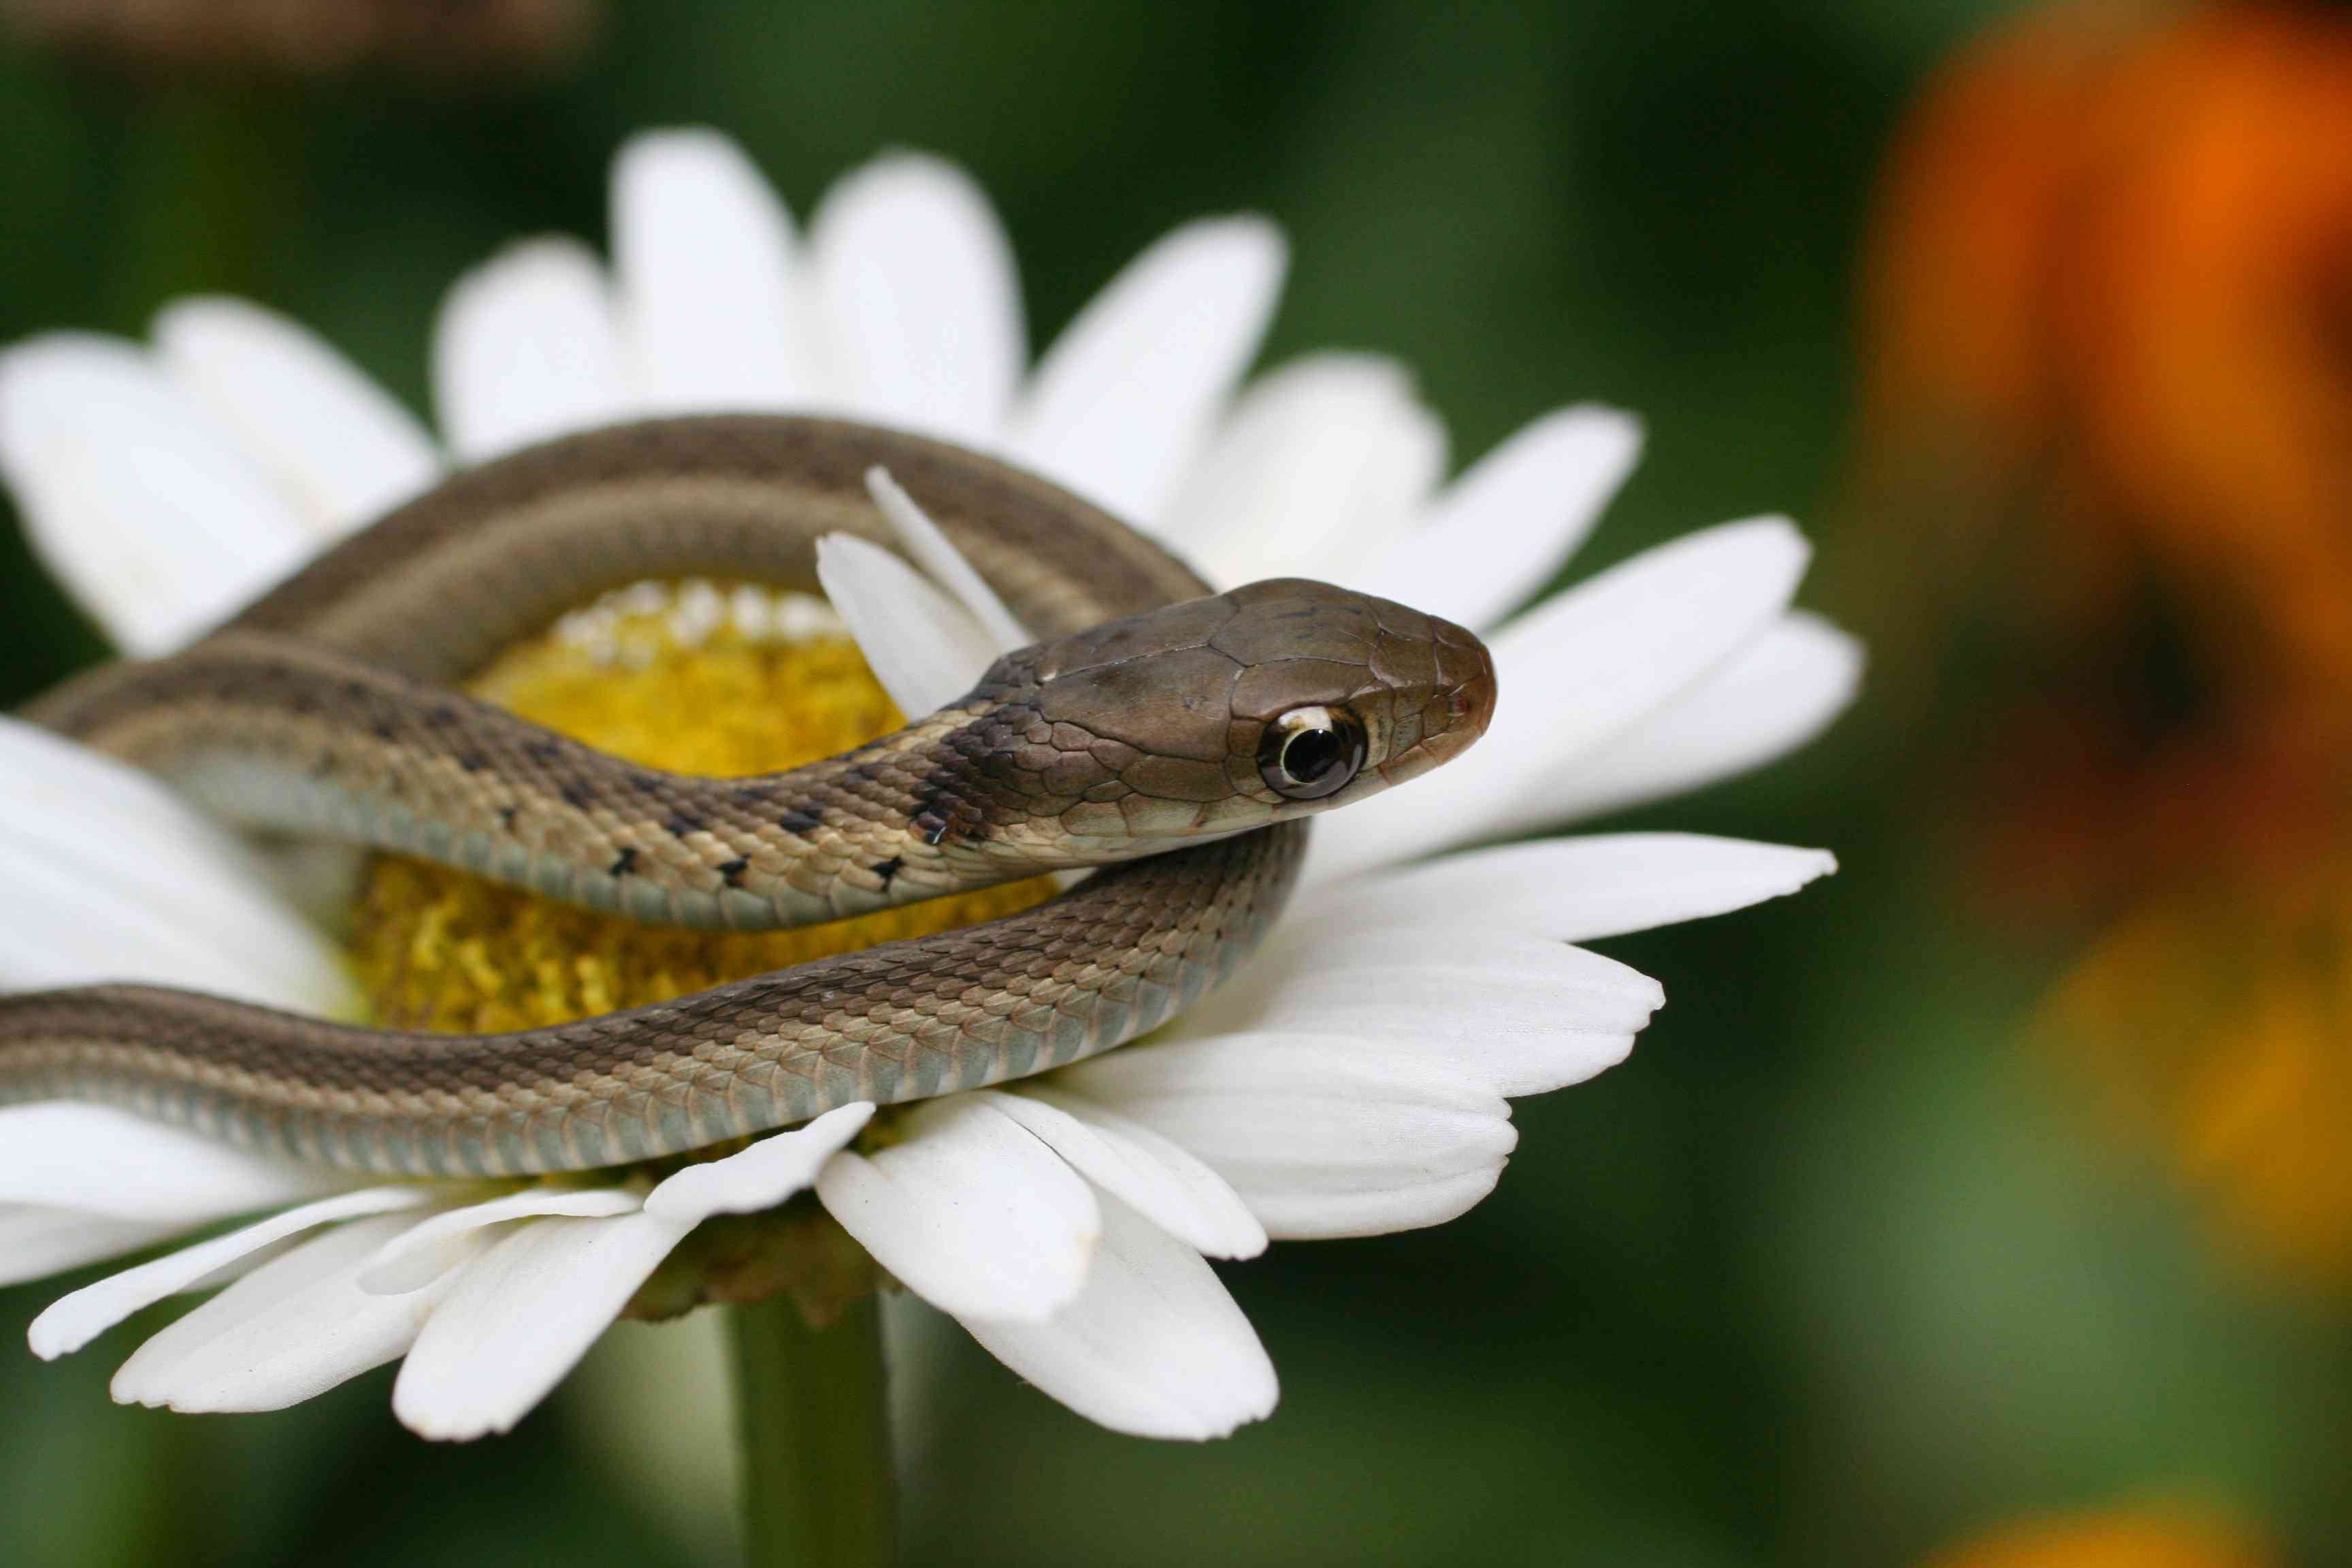 Baby garter snake on a daisy blossom